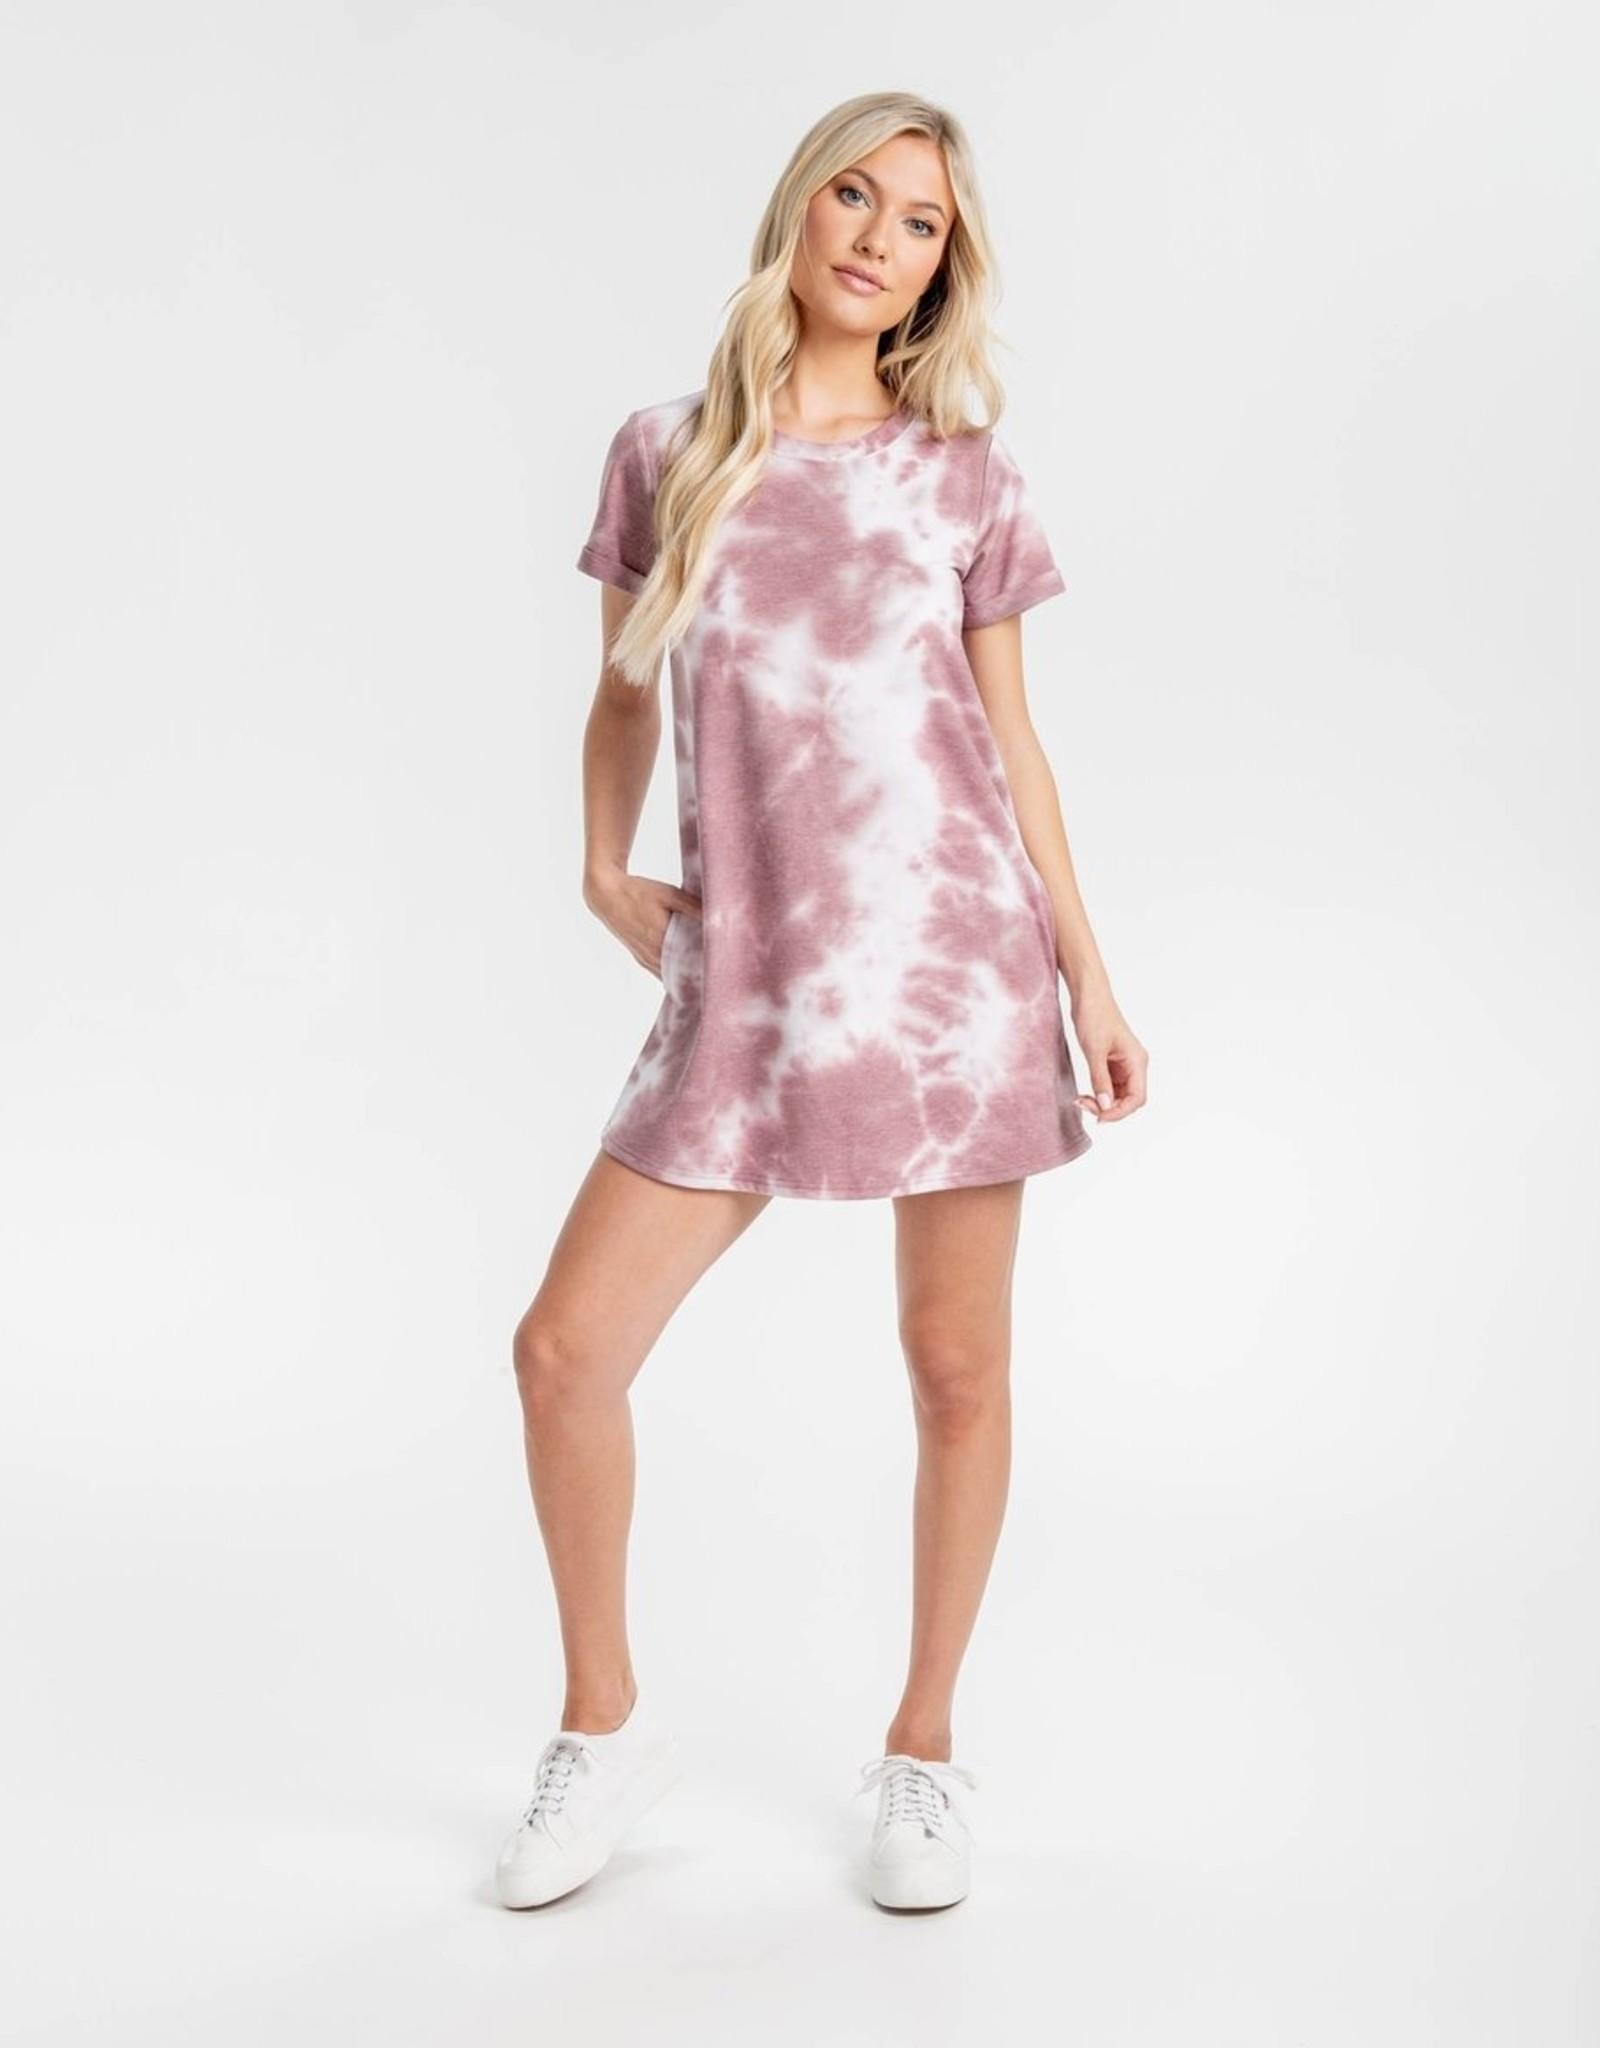 Southern Shirt Watercolor Dress